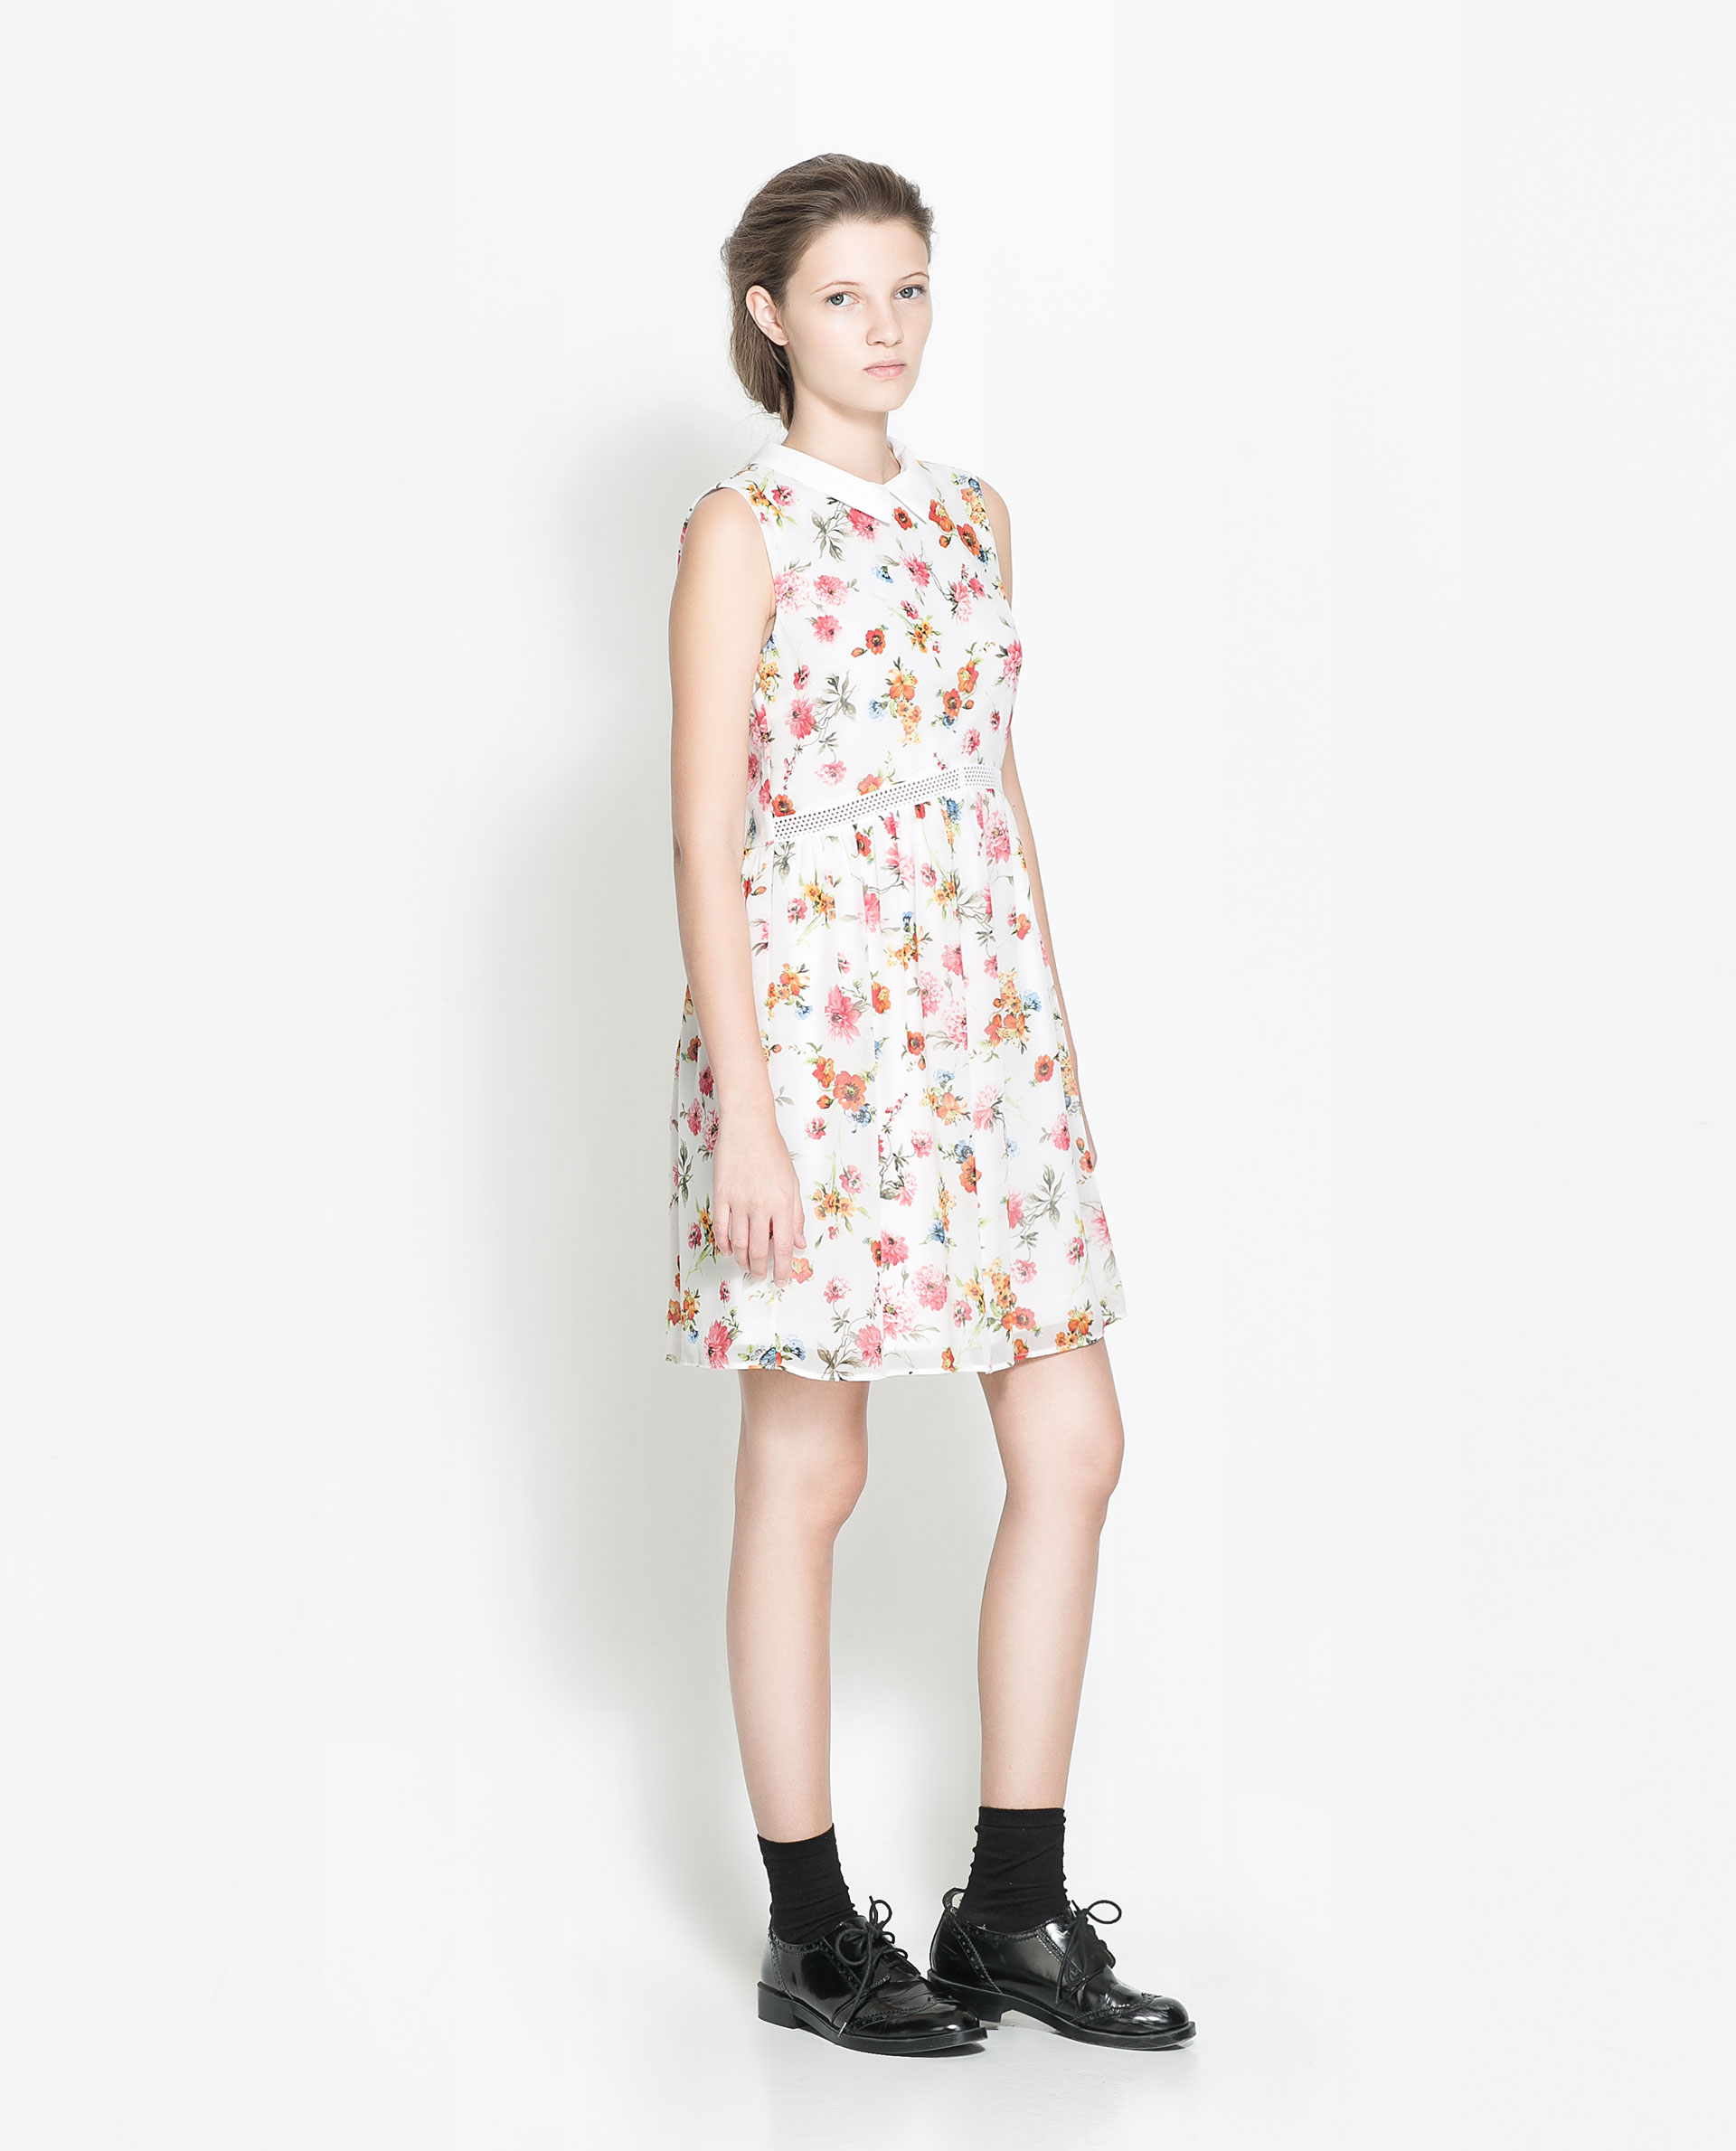 b1cbff782e1 White Floral Print Dress Zara